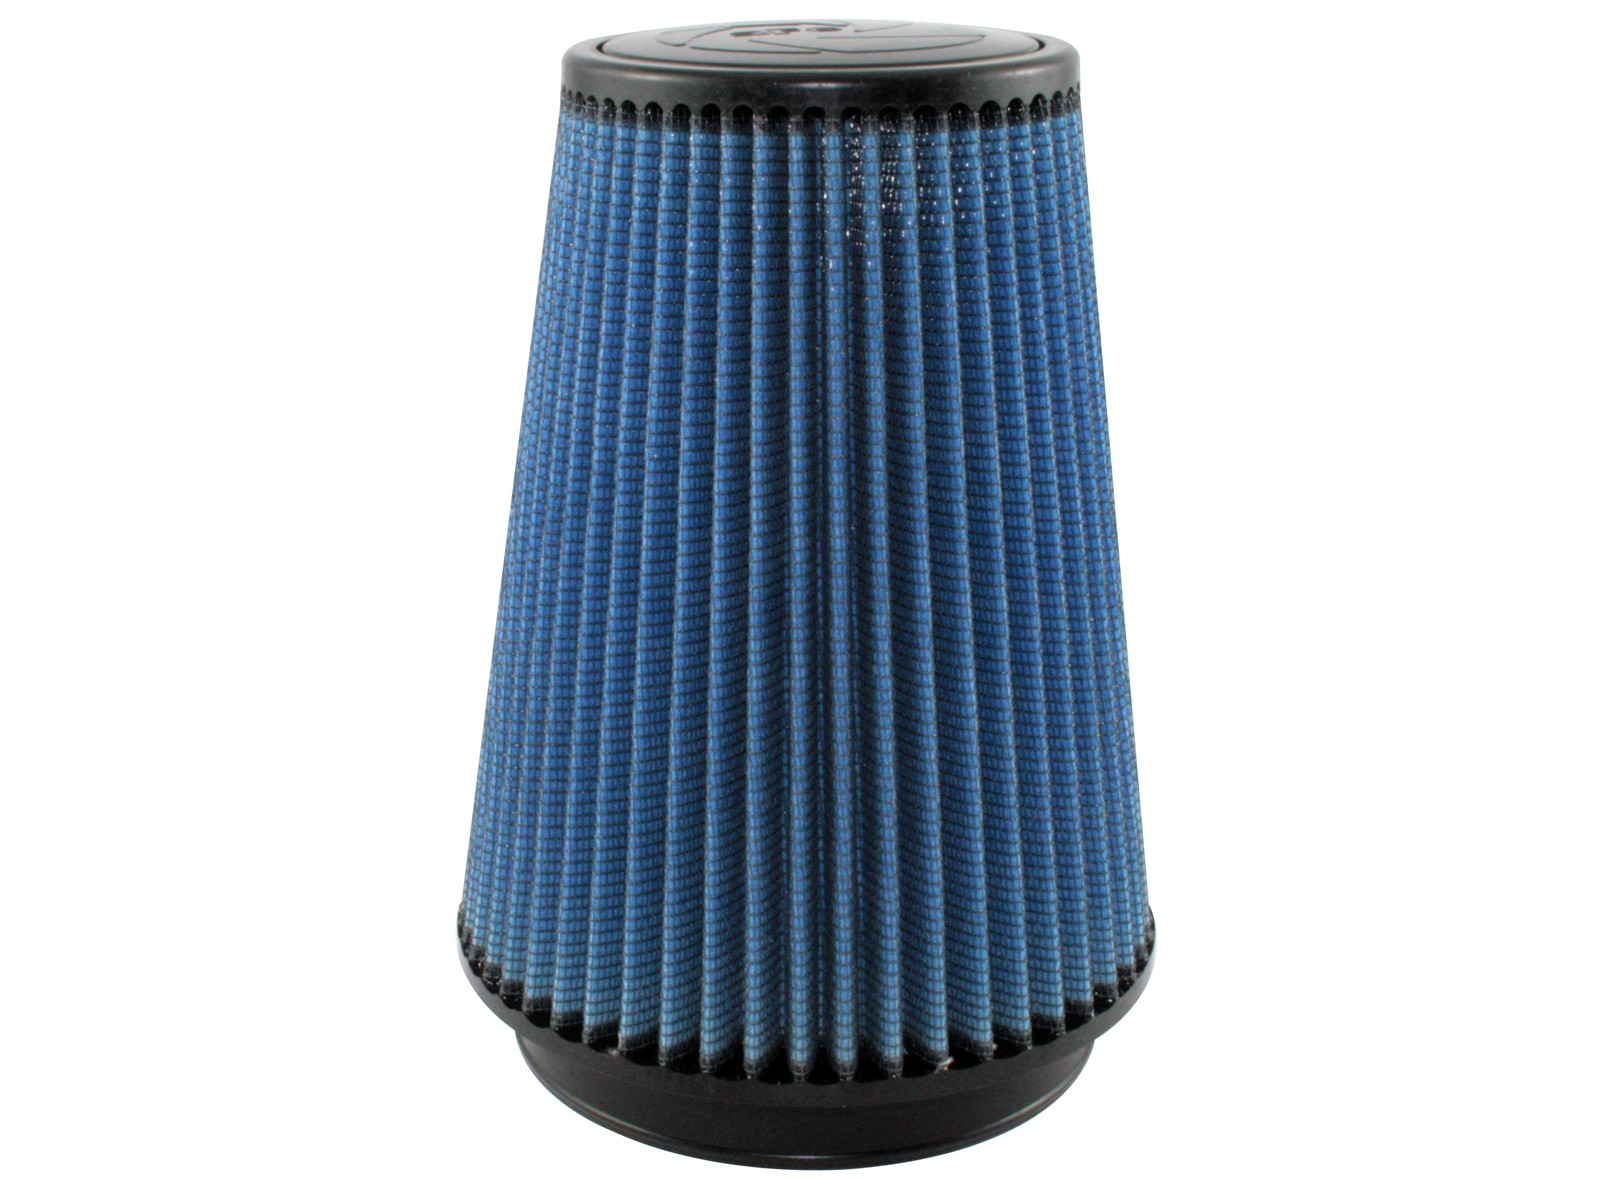 aFe POWER 24-55509 Magnum FLOW Pro 5R Air Filter